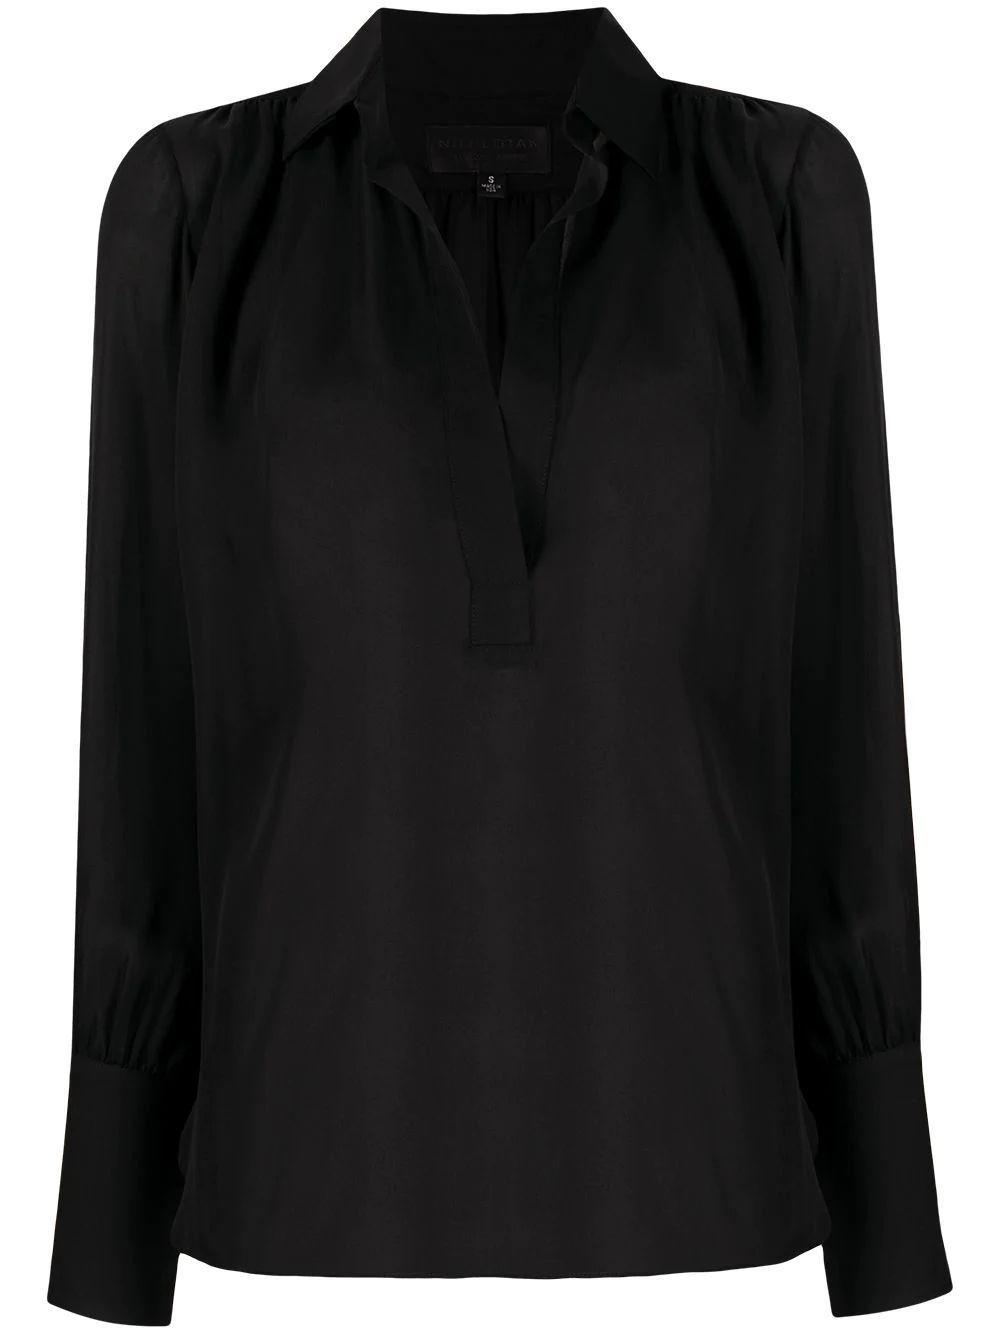 Colleen Silk Top Item # 11003-W30